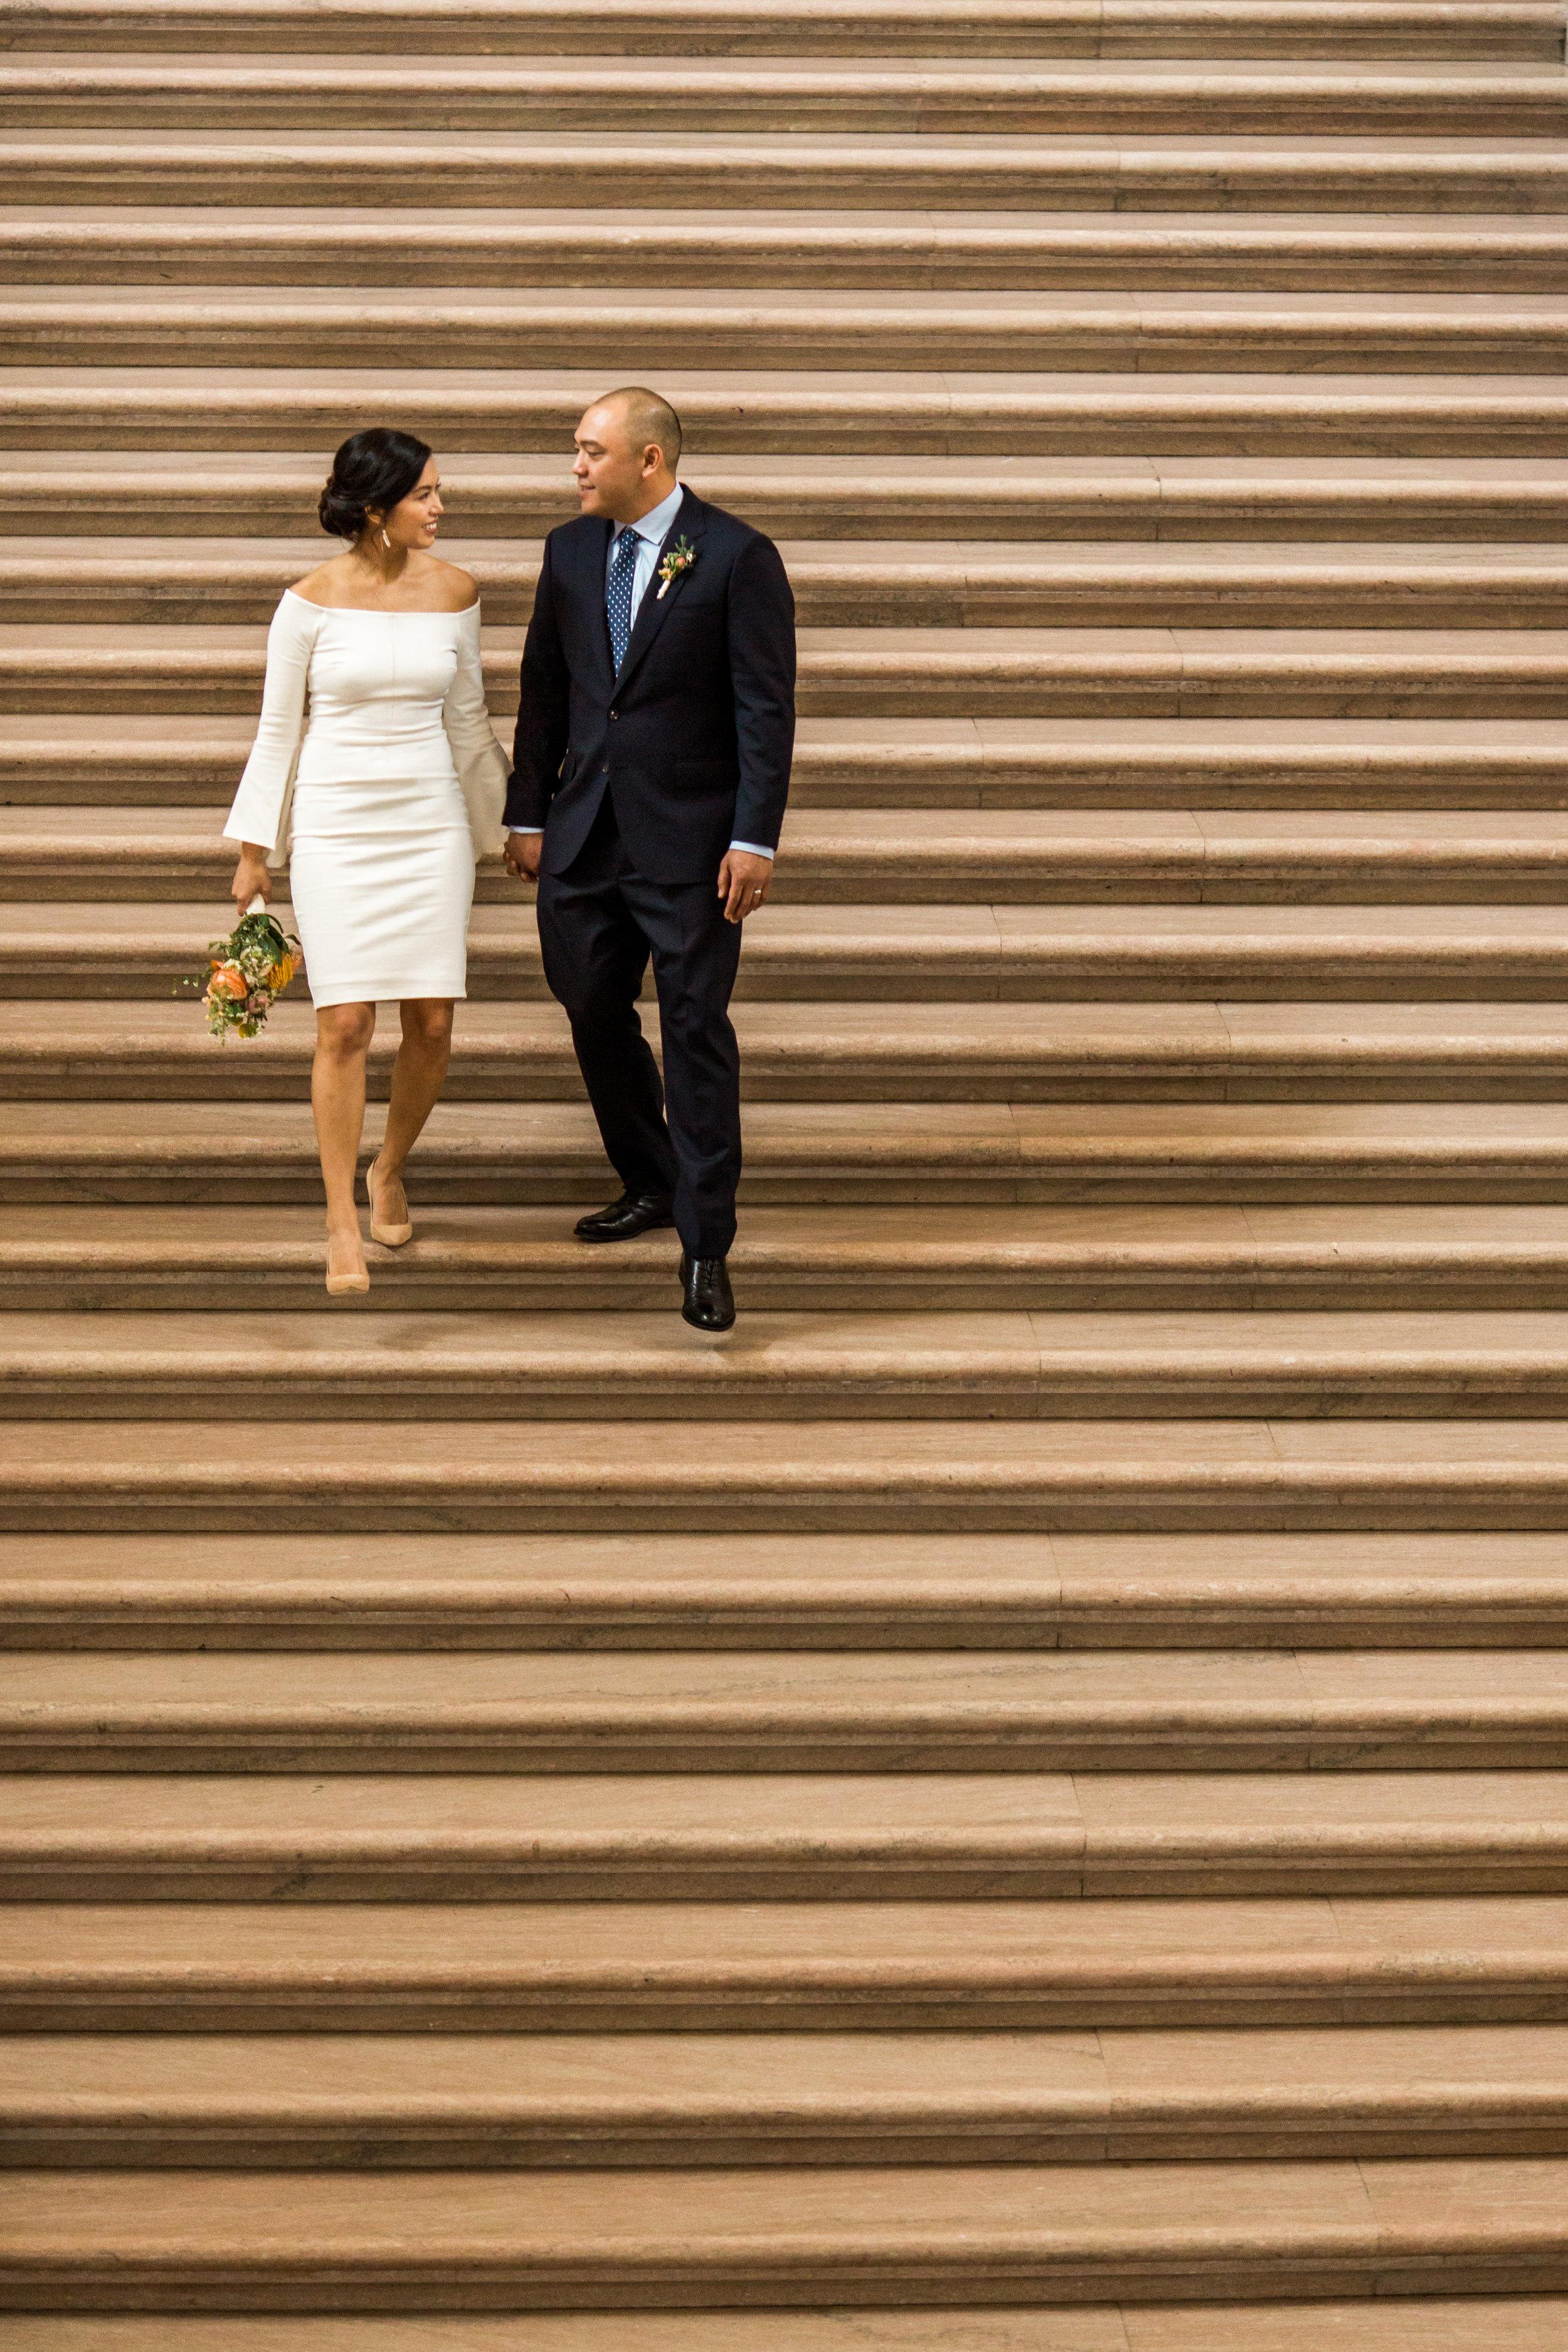 Anna + Robby Abaya's Wedding 066-Edit.JPG